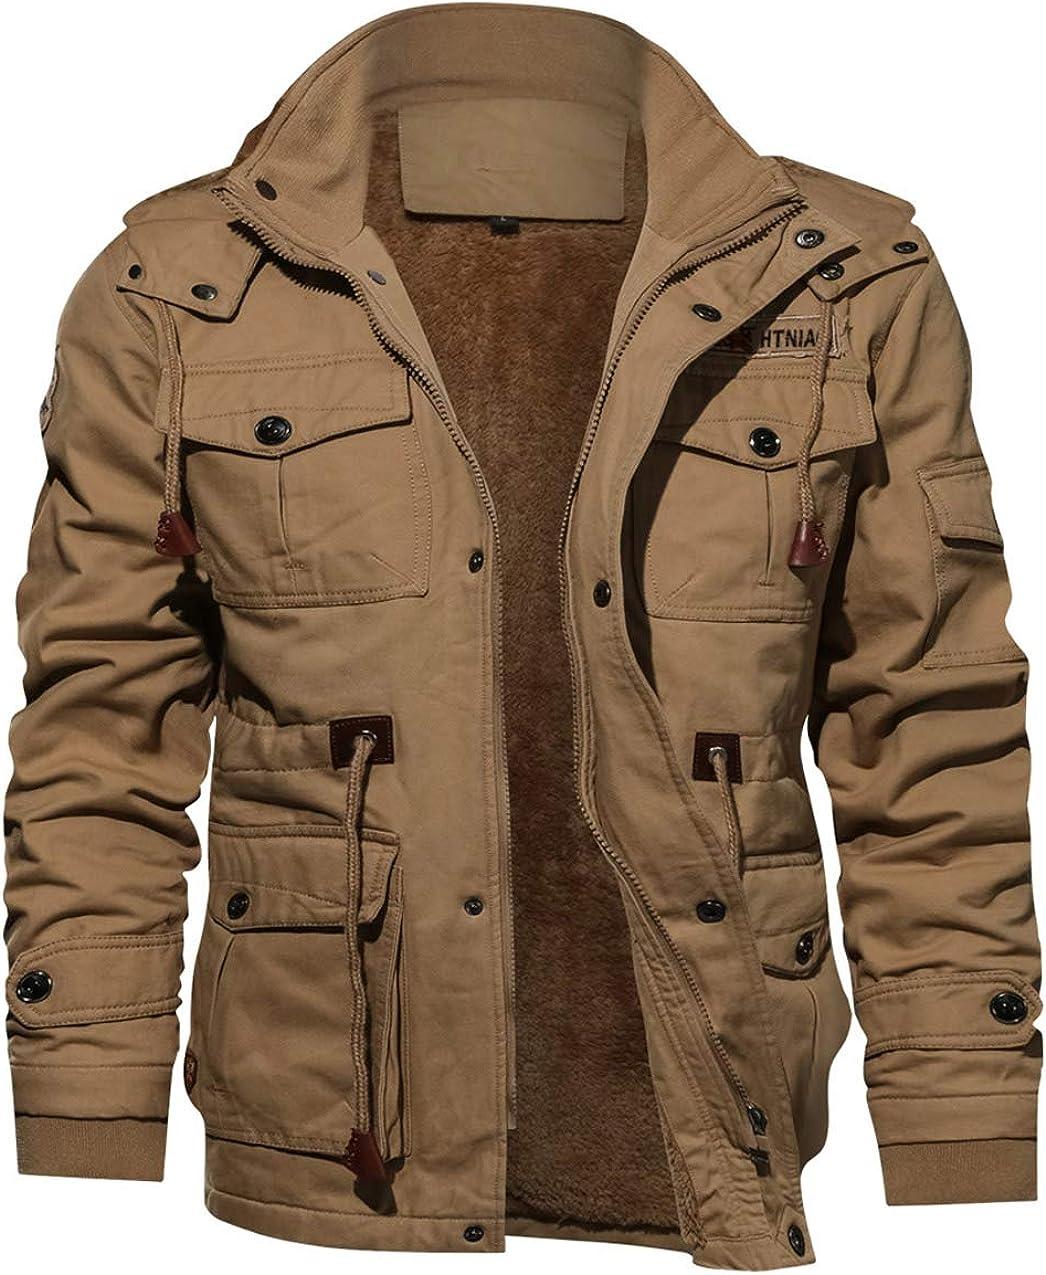 TACVASEN Men's Jacket-Casual Winter Cotton Military Jacket Thicken Hooded Cargo Coat